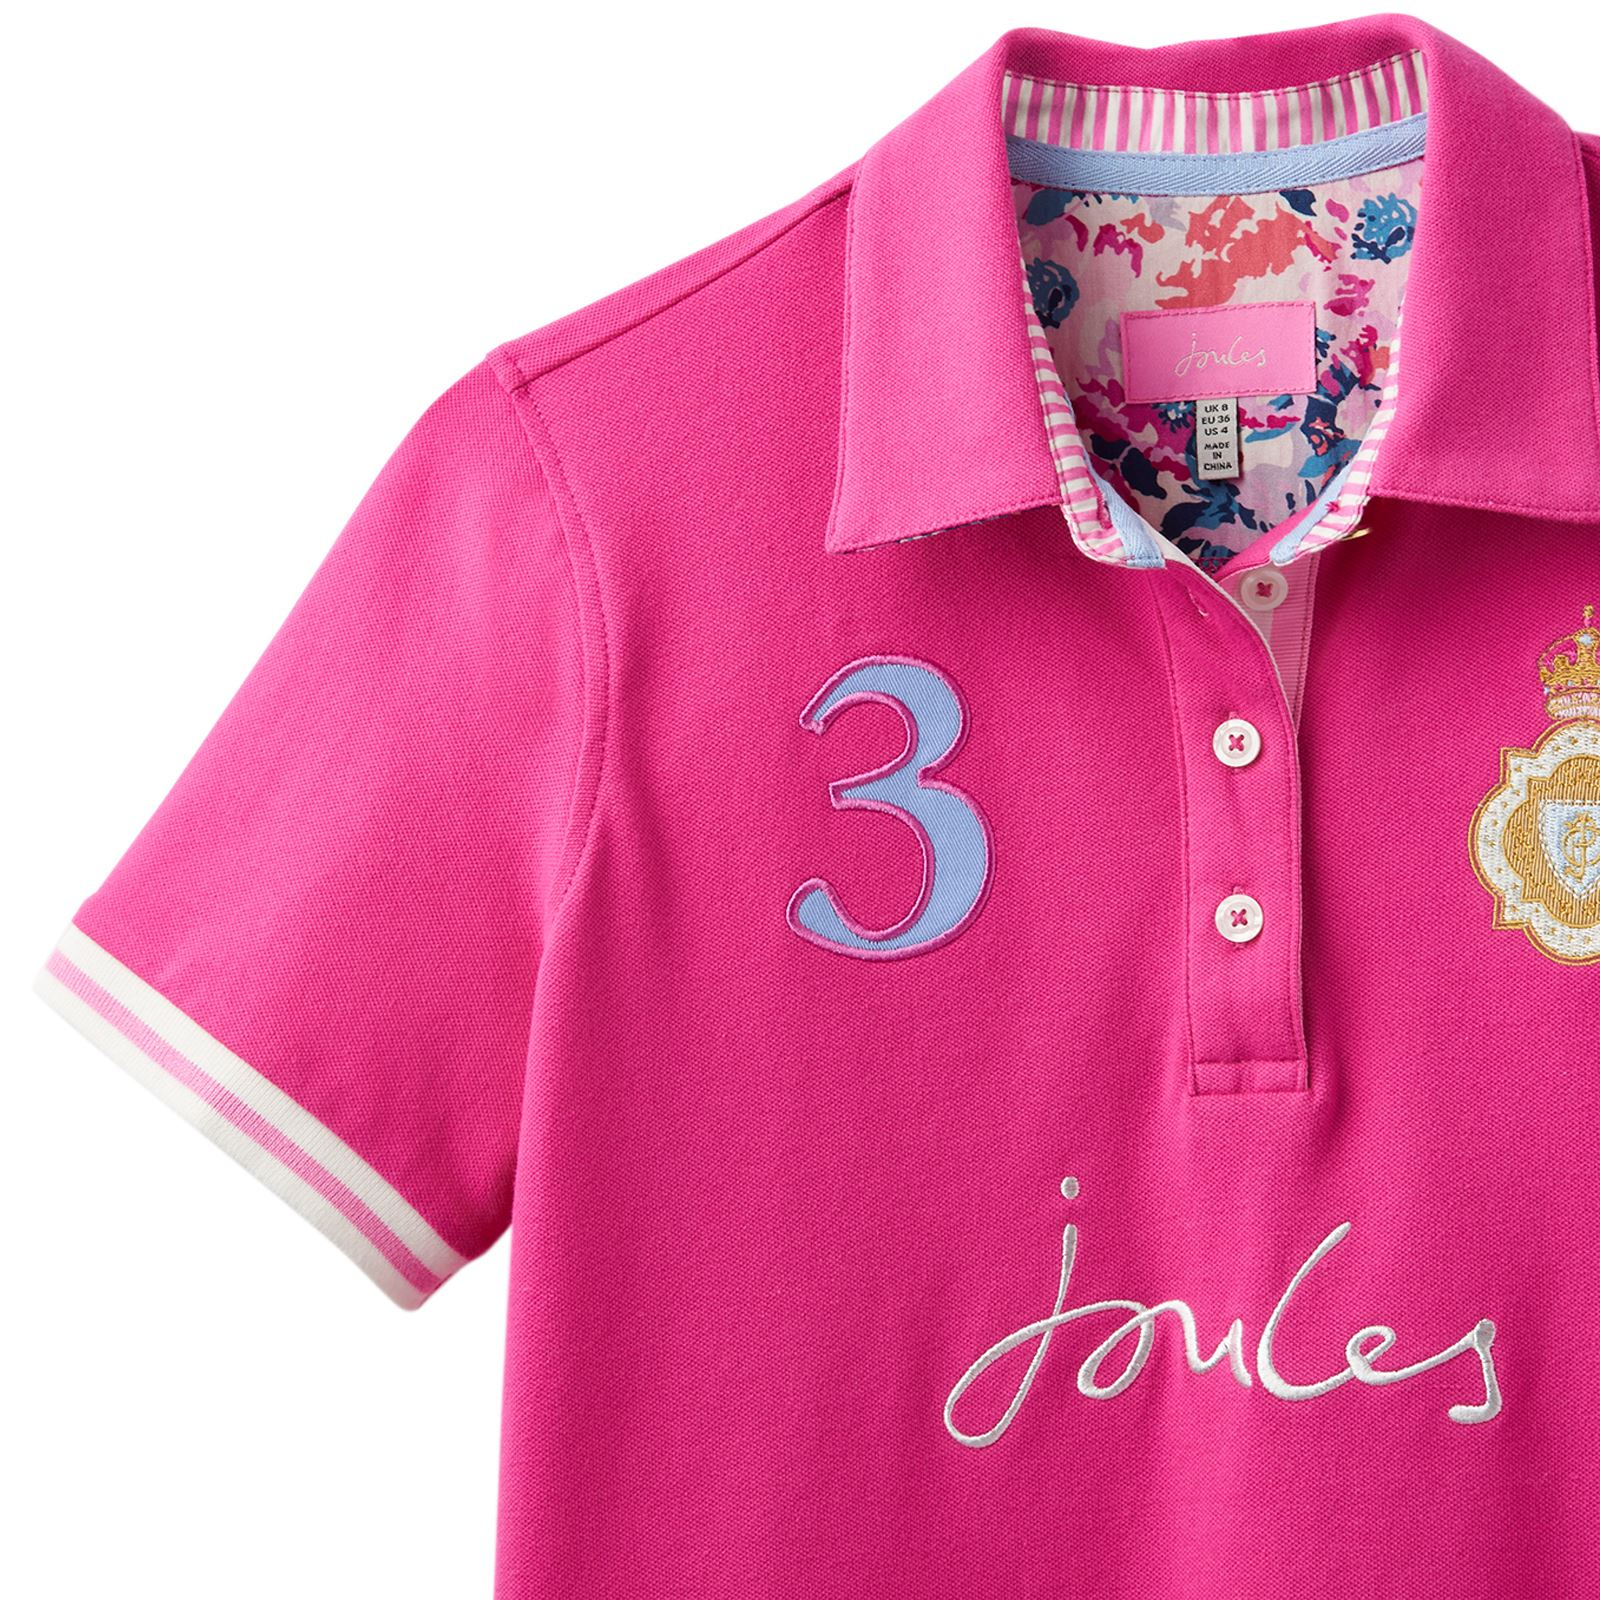 Joules Claredon Ladies Horse Riding Pique Short Sleeve Heritage Polo Shirt